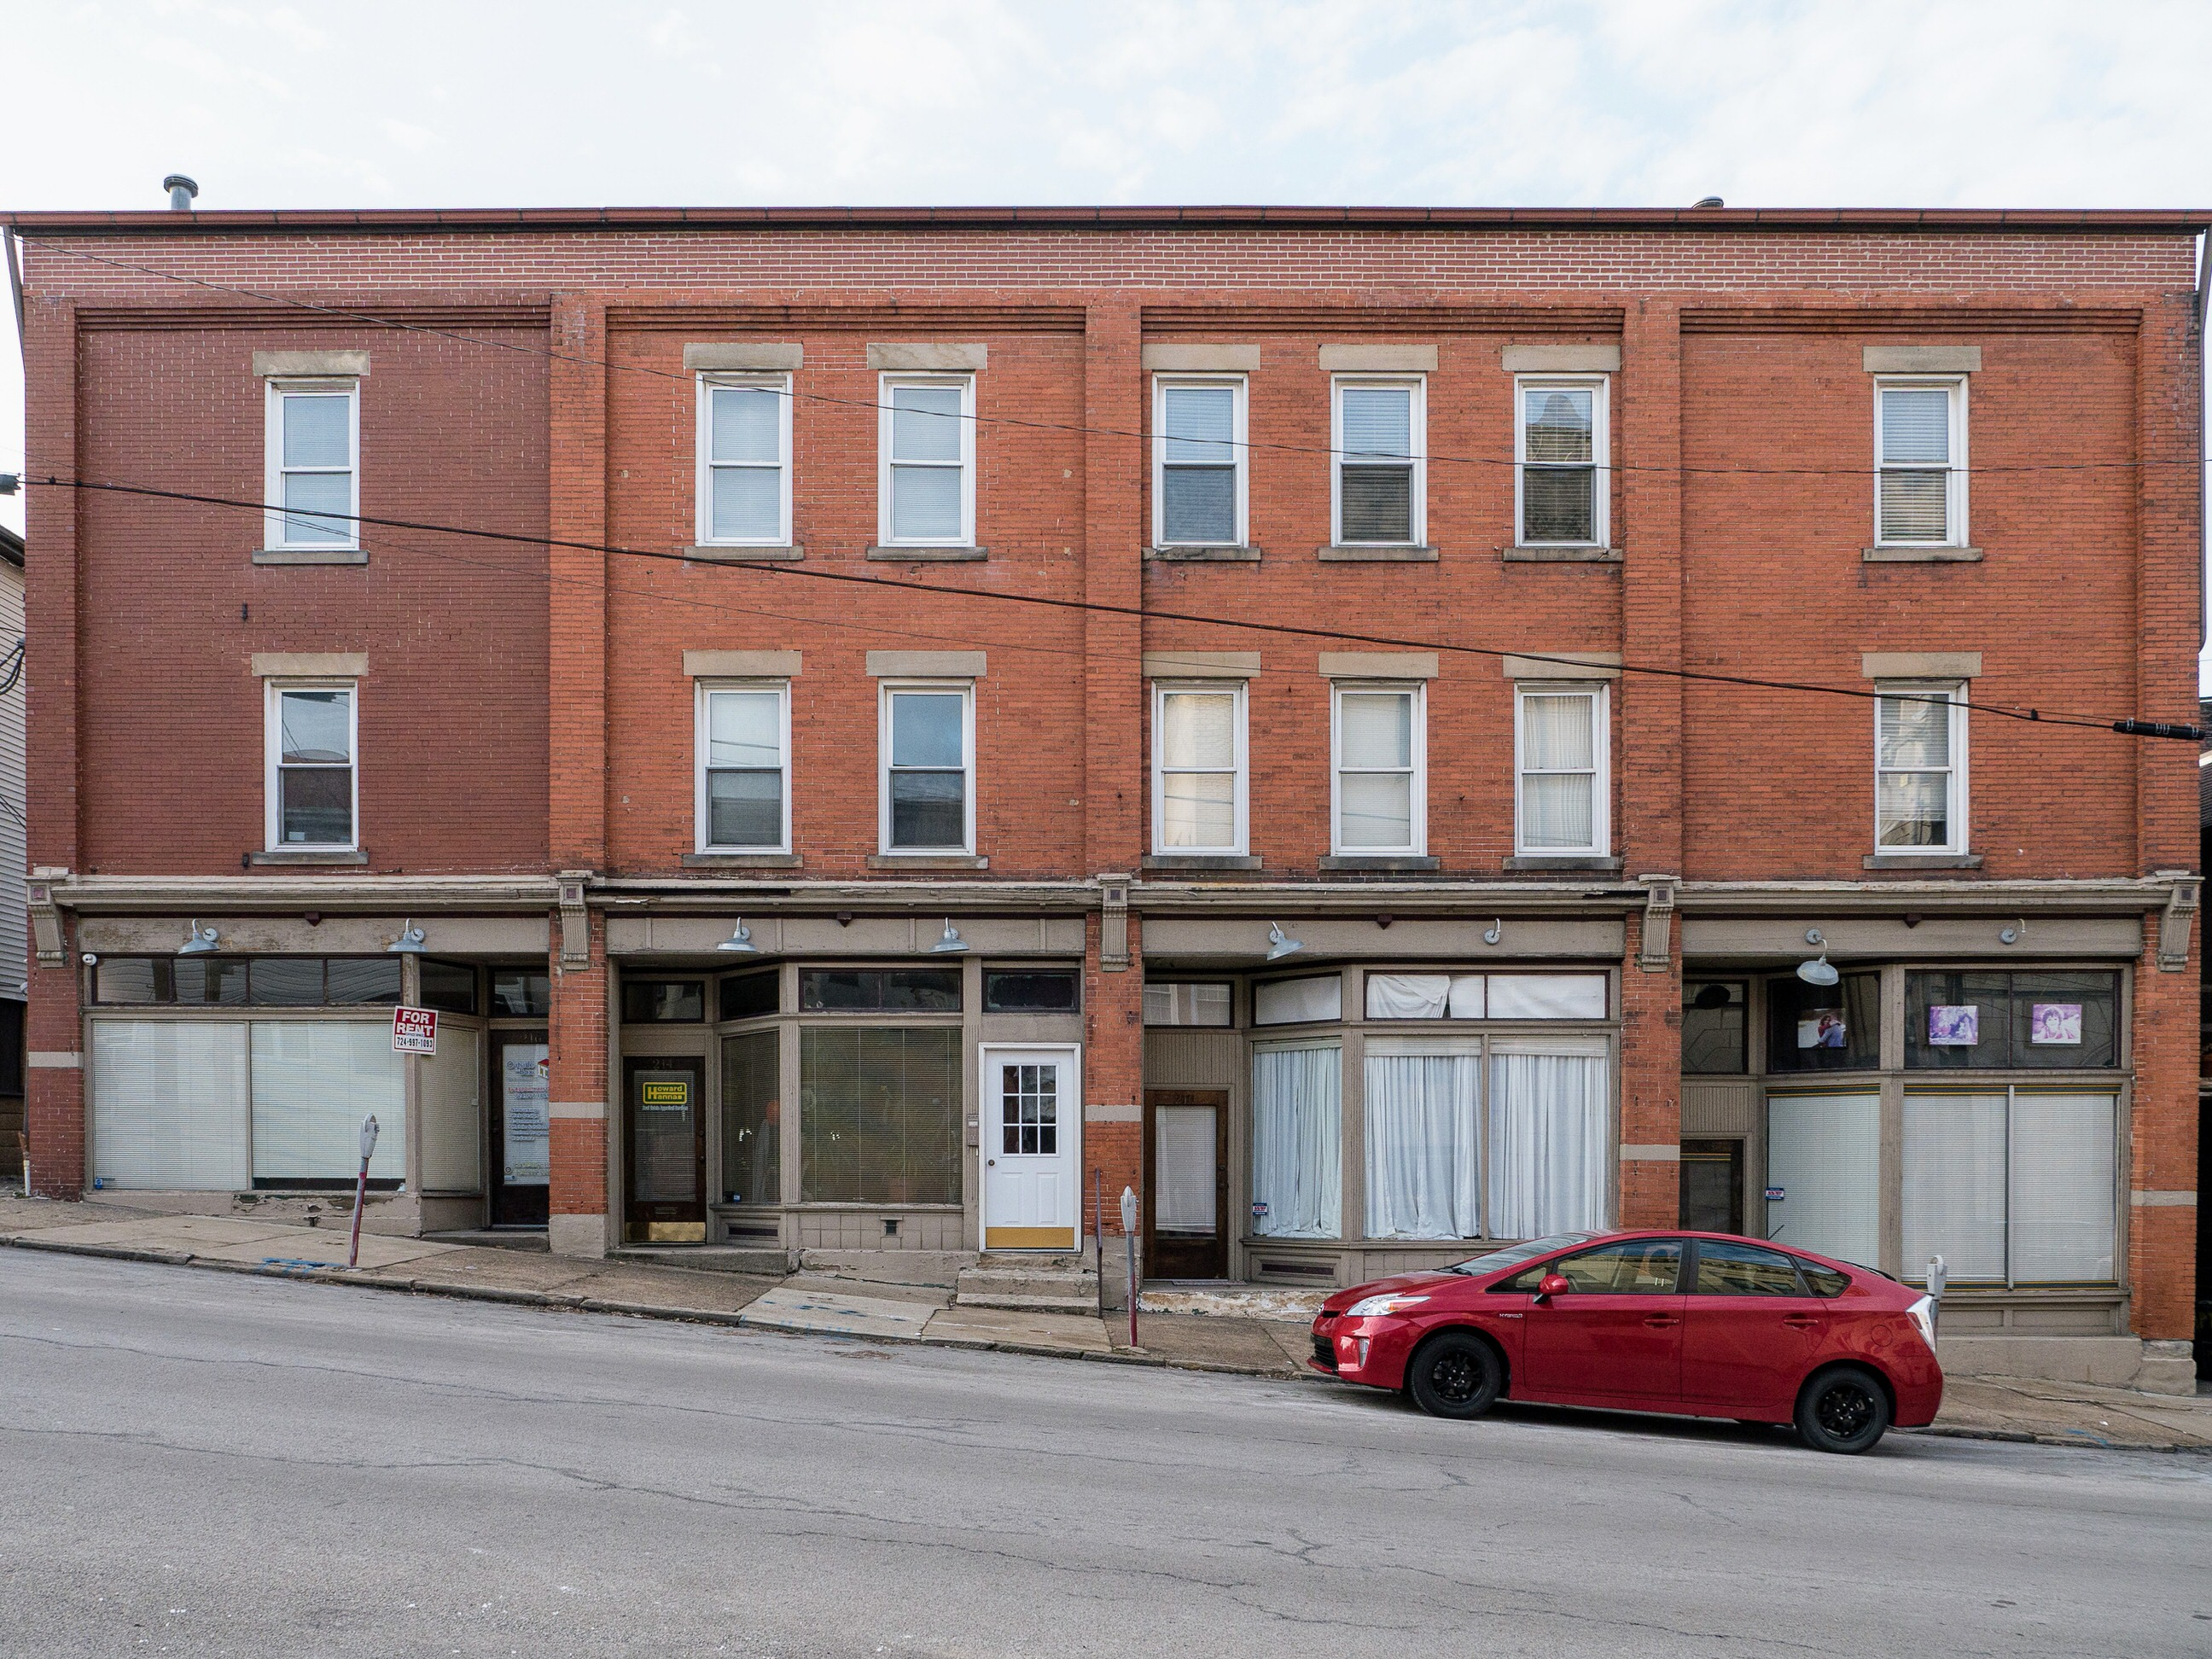 Photo of building at 206 - 212 Second Street, Monongahela, Pa. 15063 along rt 88 and rt 136. Photo property of the Monongahela Main Street Program.